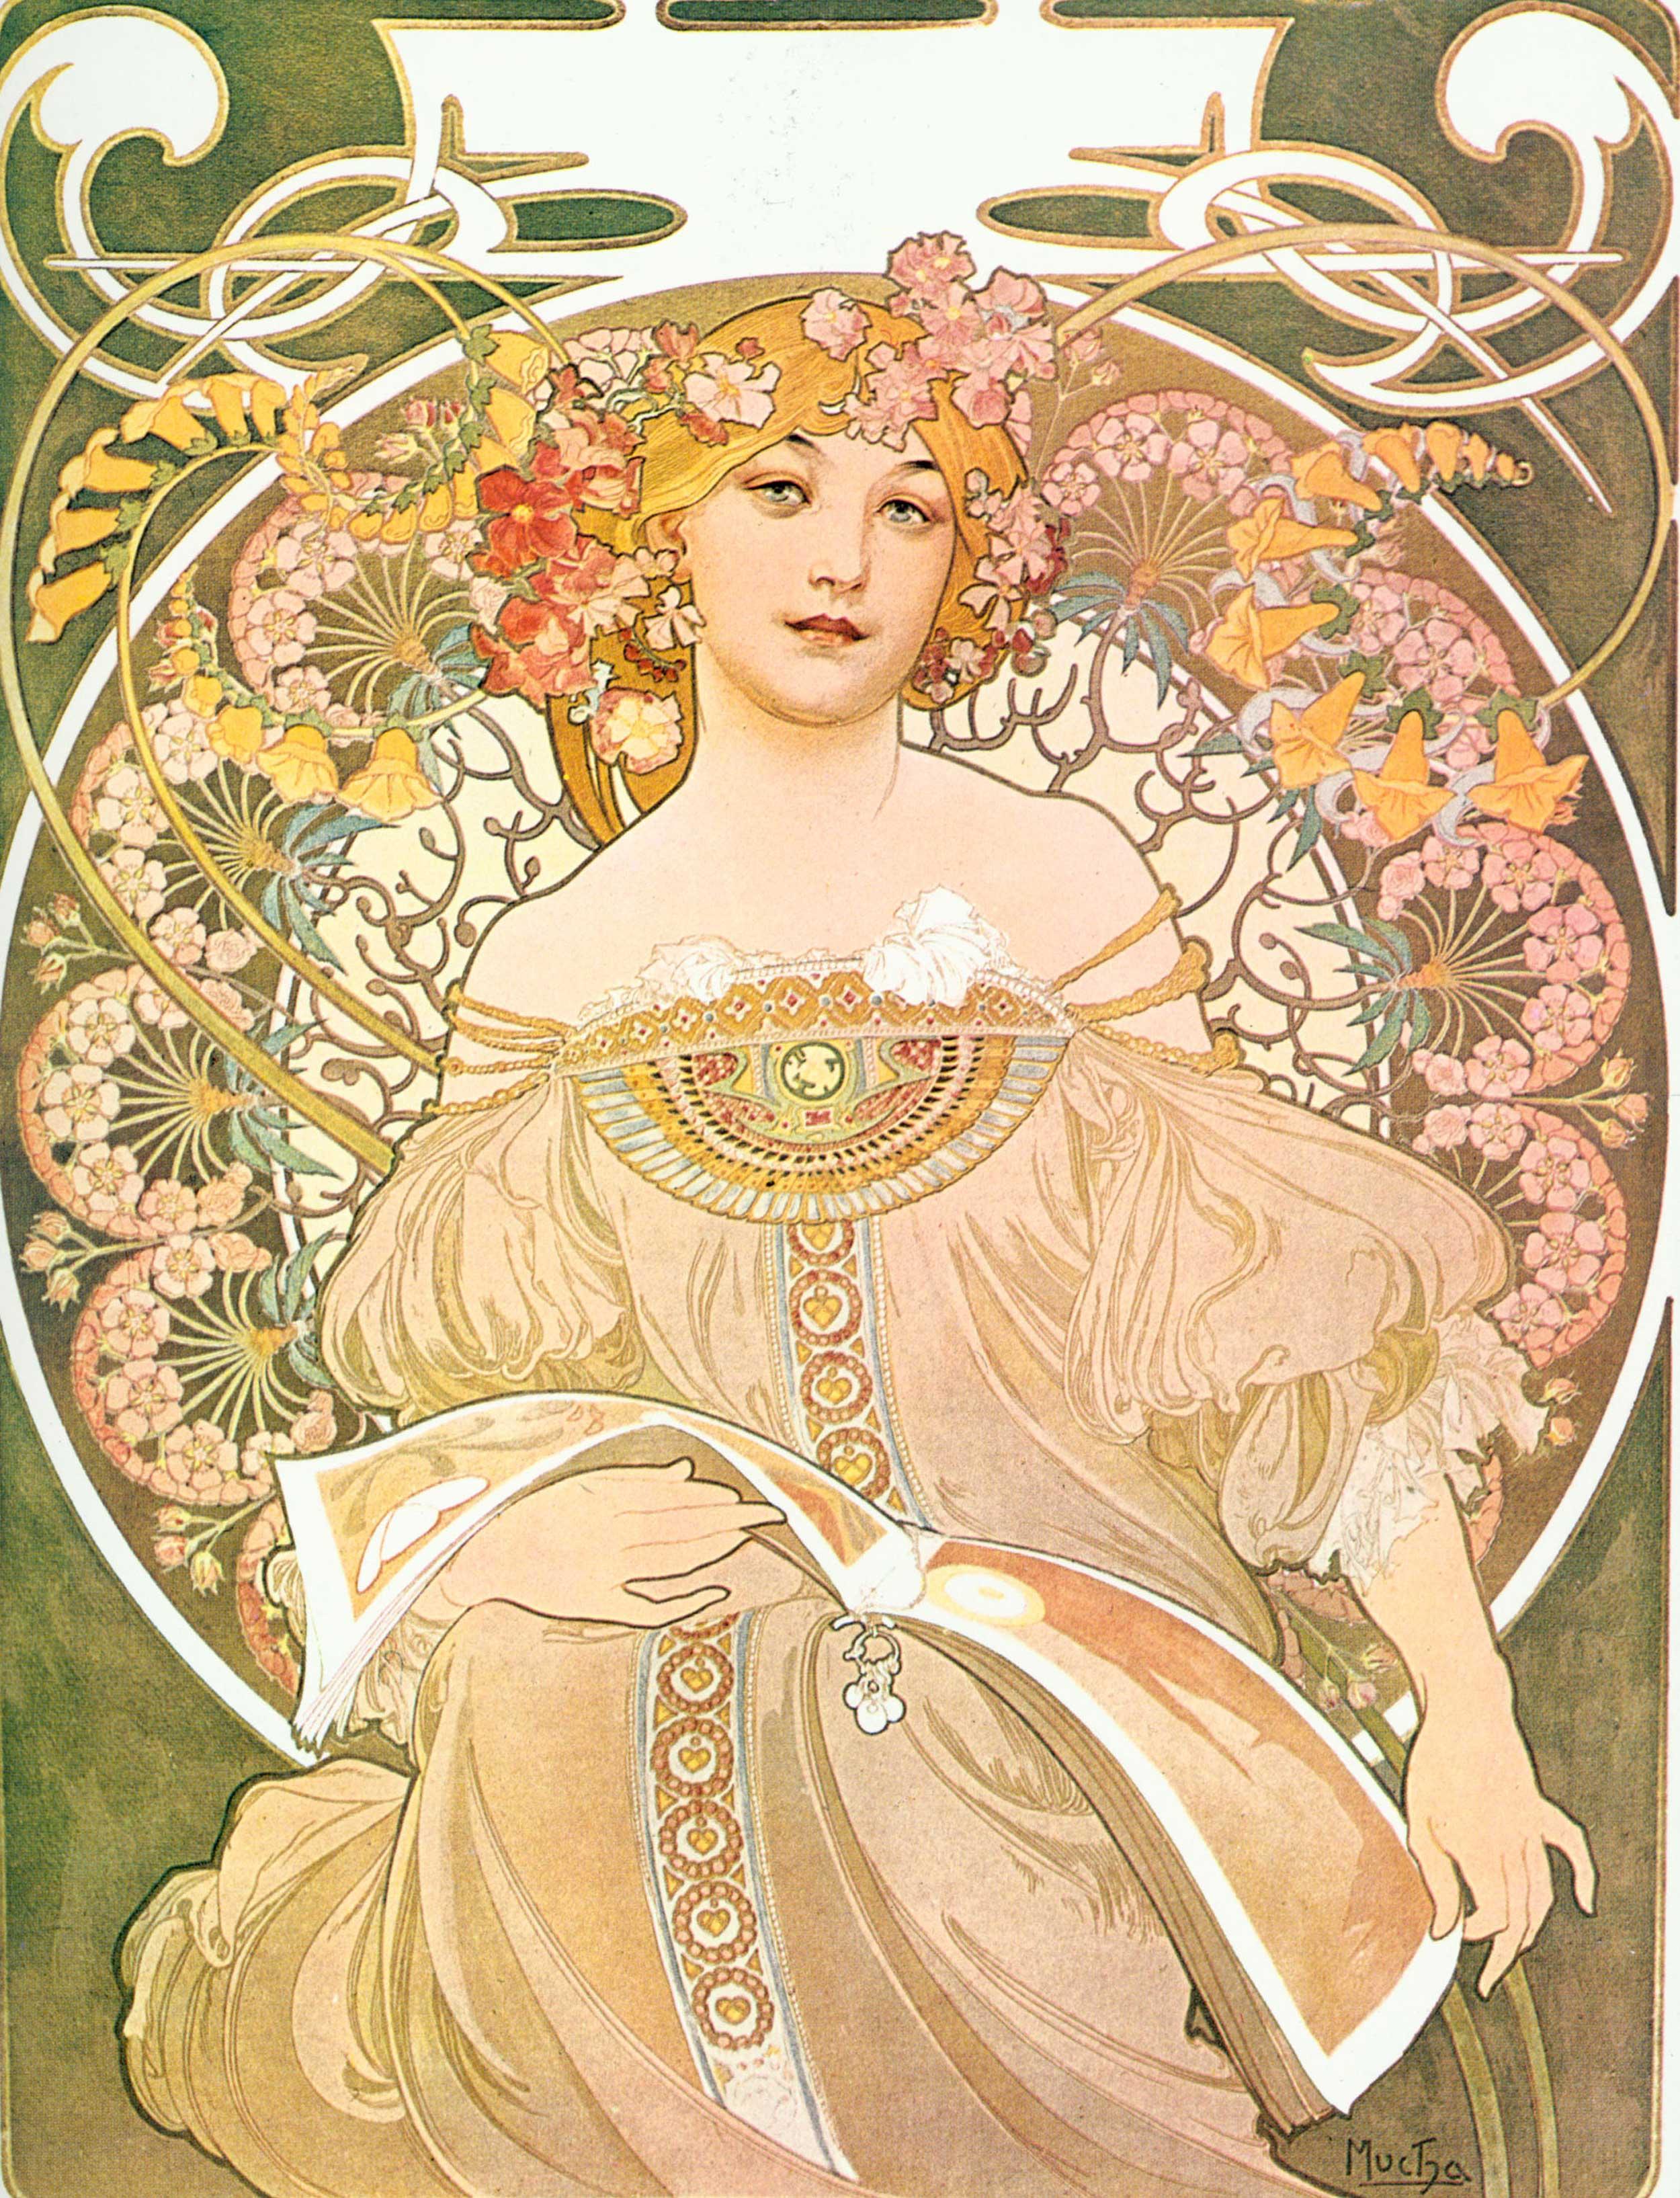 Alfons Mucha - Reverie or Daydream, 1898, Schattenfugenrahmen Natur